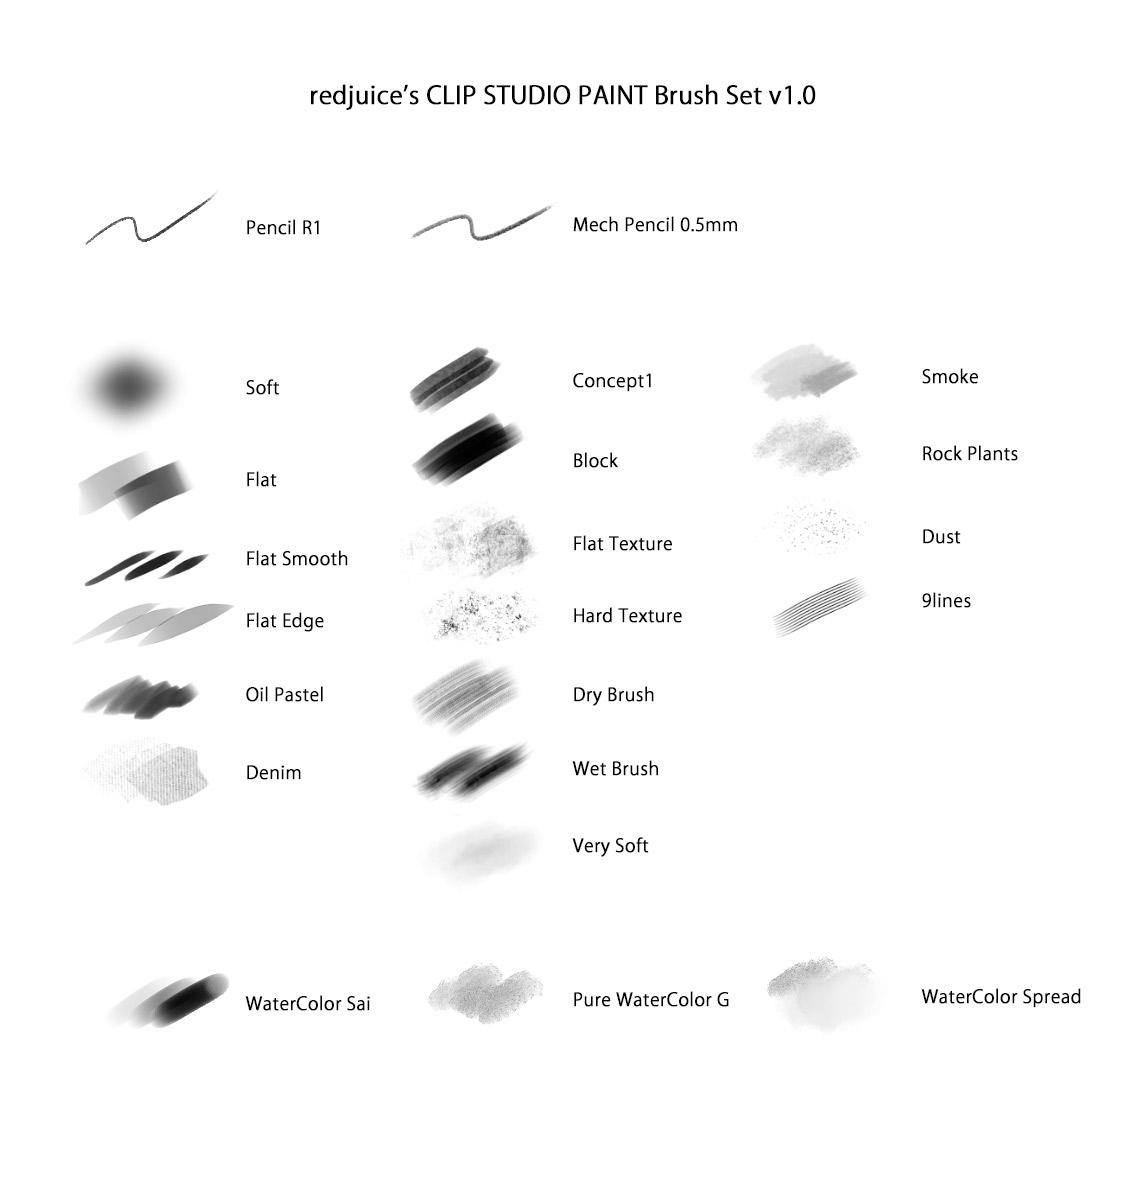 redjuice's Brush Set for CLIP STUDIO PAINT by redjuice999 on DeviantArt.